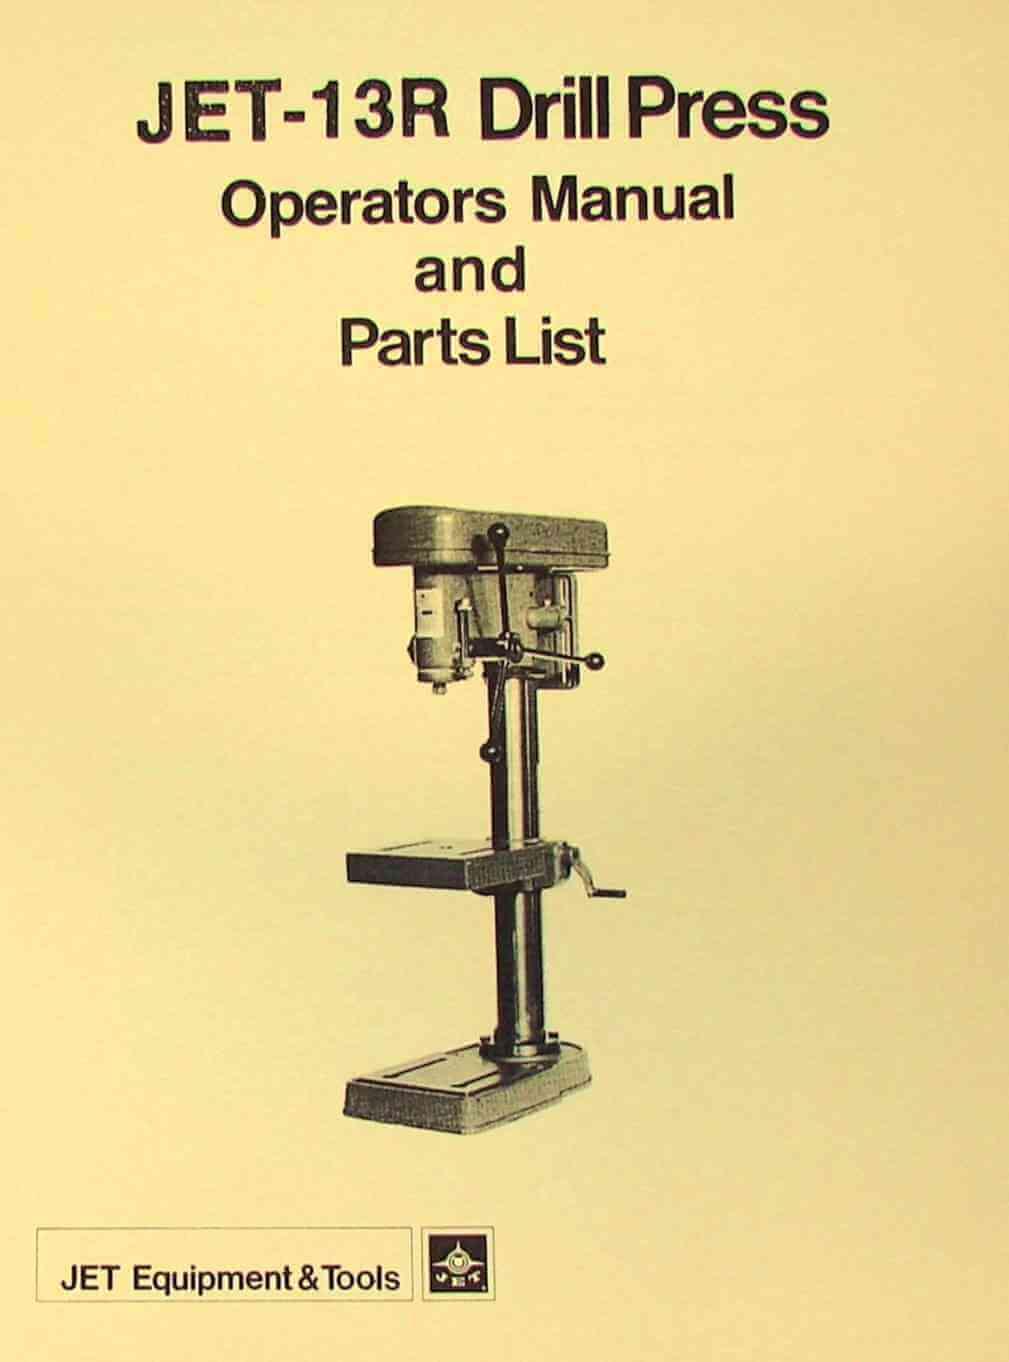 JET-Asian 13R Drill Press Owner's & Parts Manual   Ozark Tool Manuals & Books